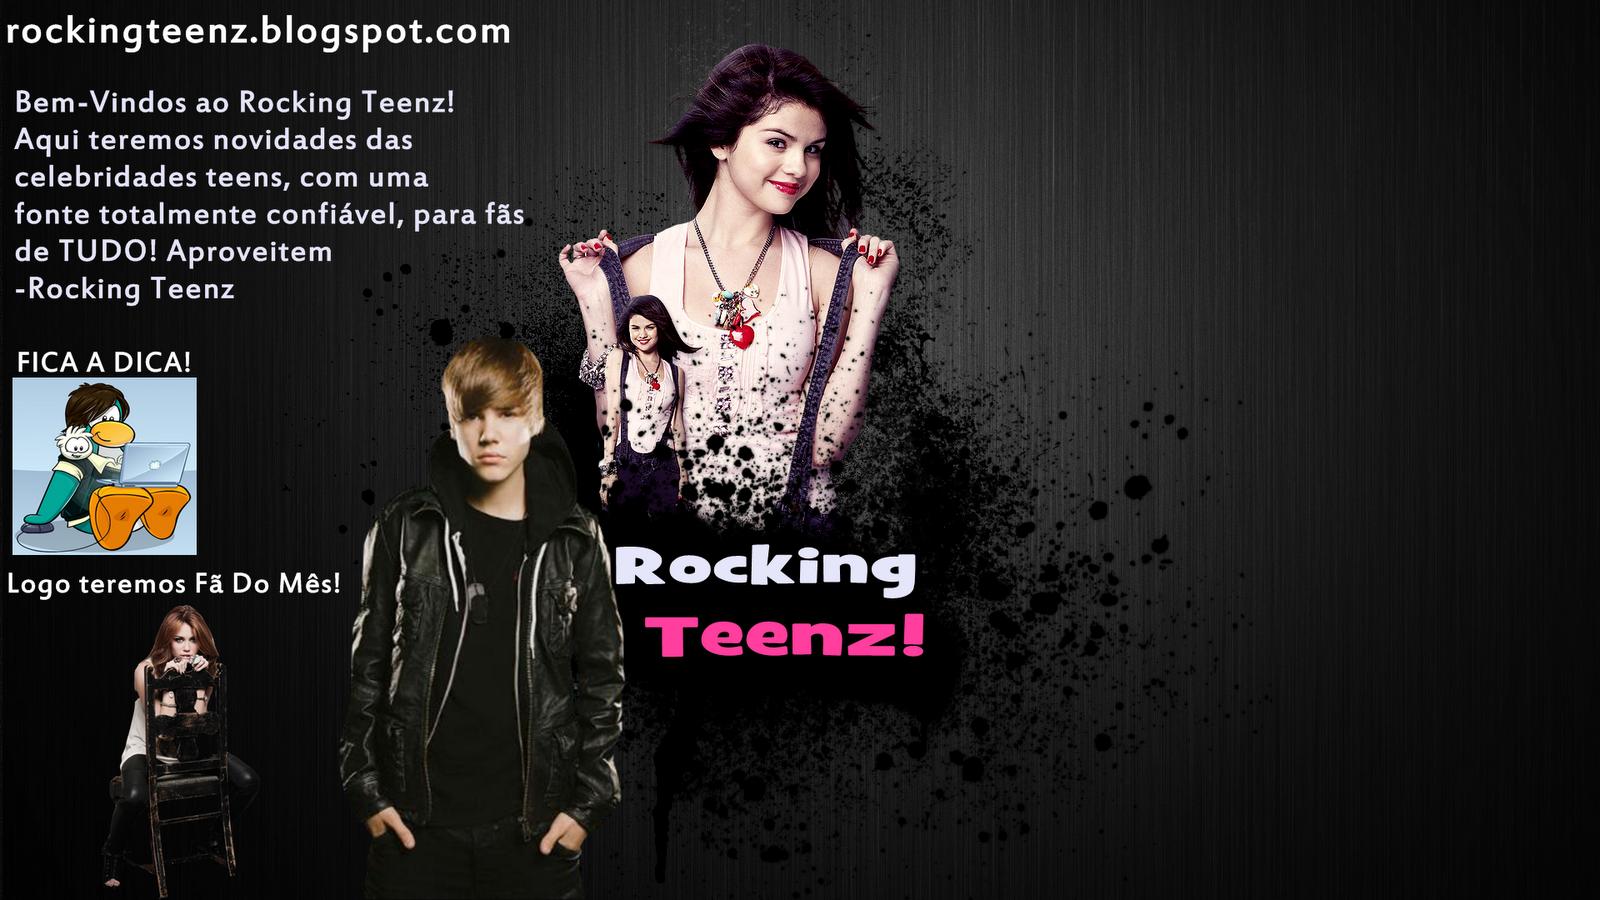 Rocking Teenz!